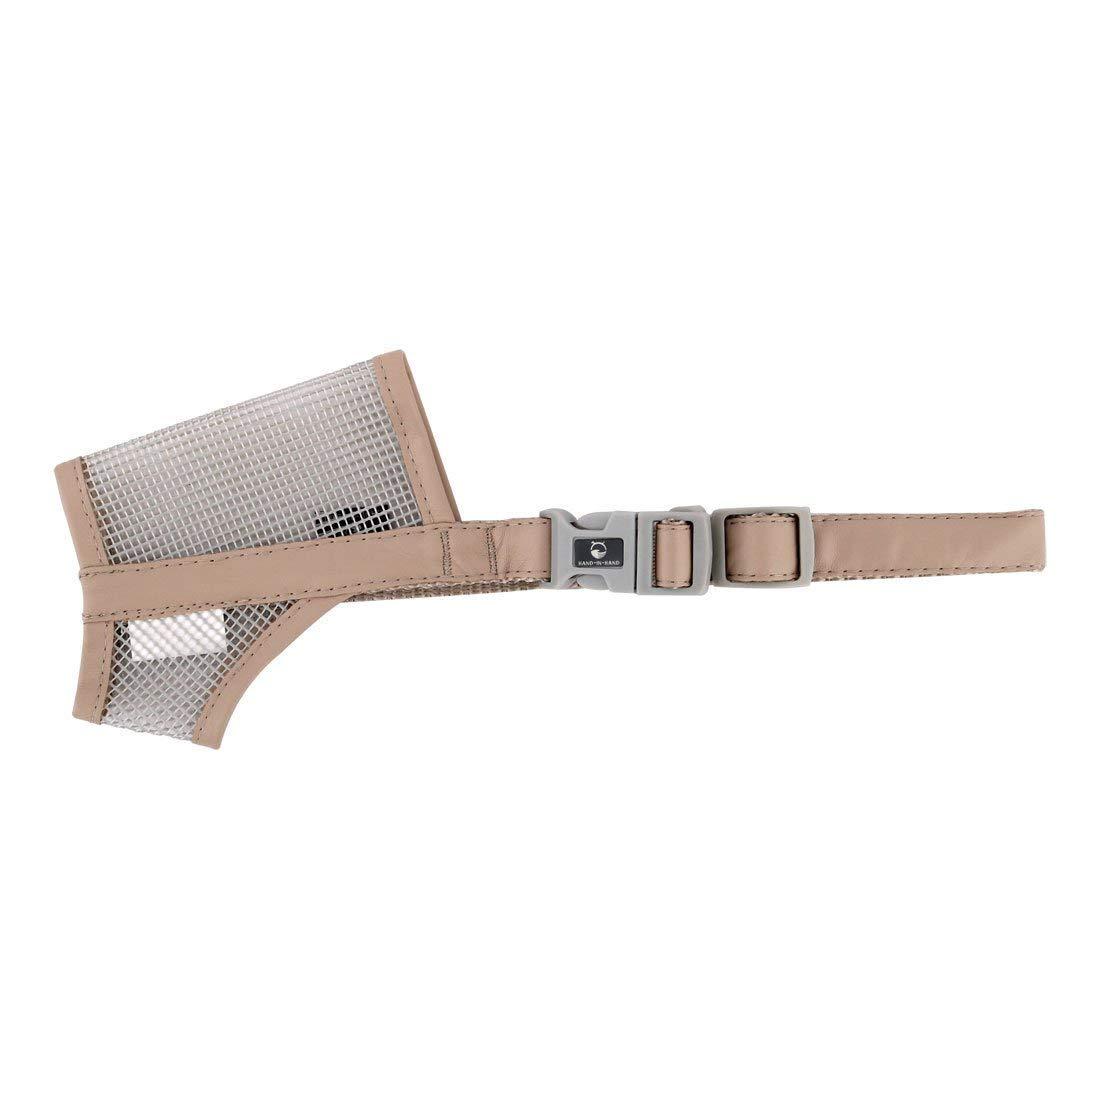 1Pc Faux Leather Edge Pet Dog Mesh Design Adjustable Belt Predector Muzzle Mouth Cover